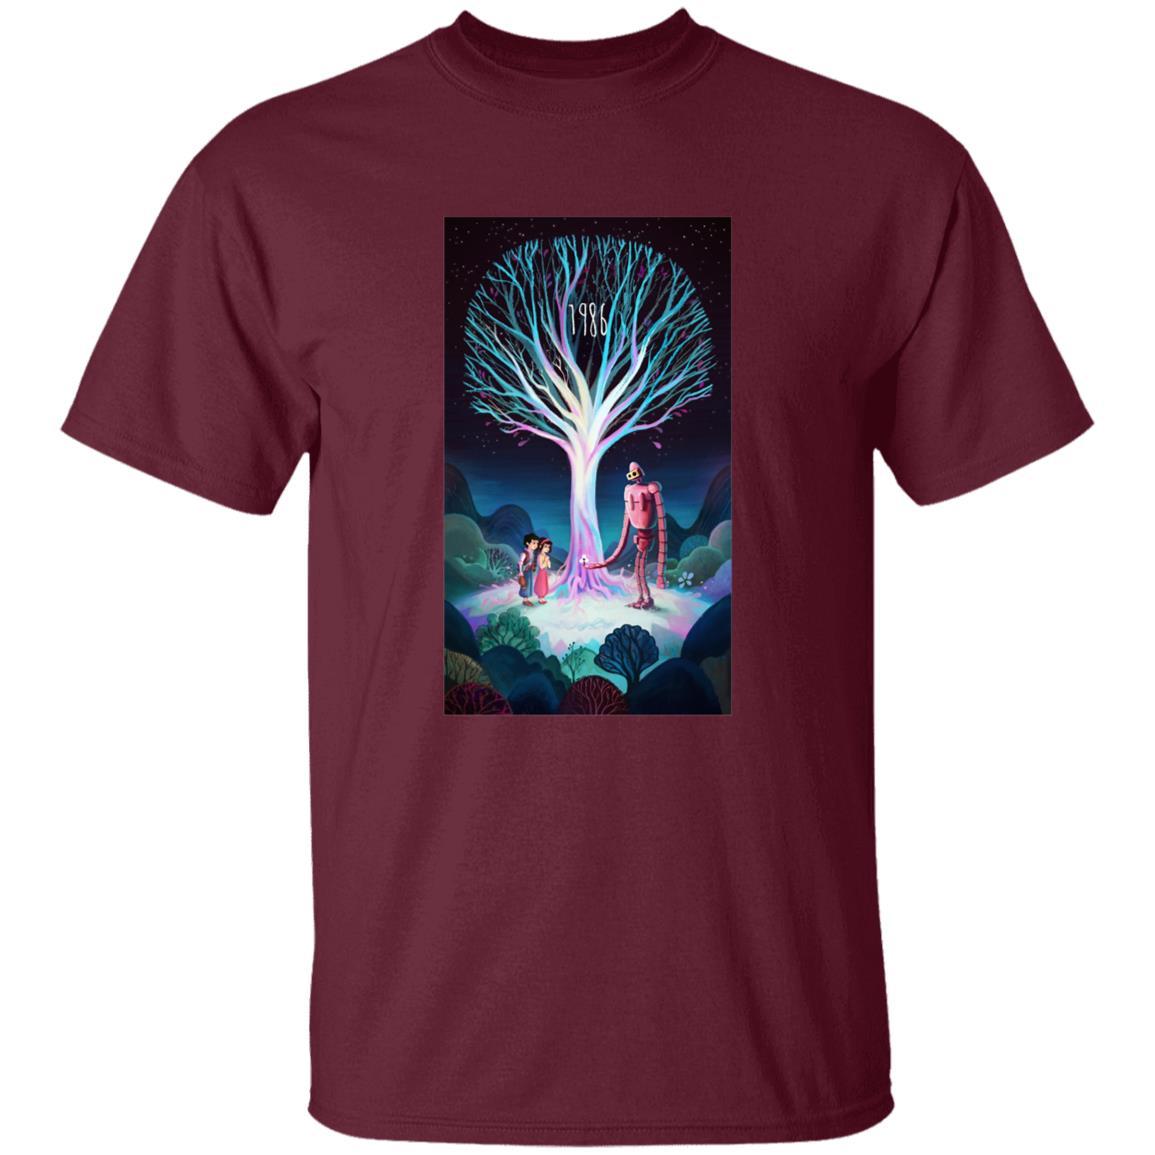 Laputa: Castle in The Sky 1986 Illustration T Shirt